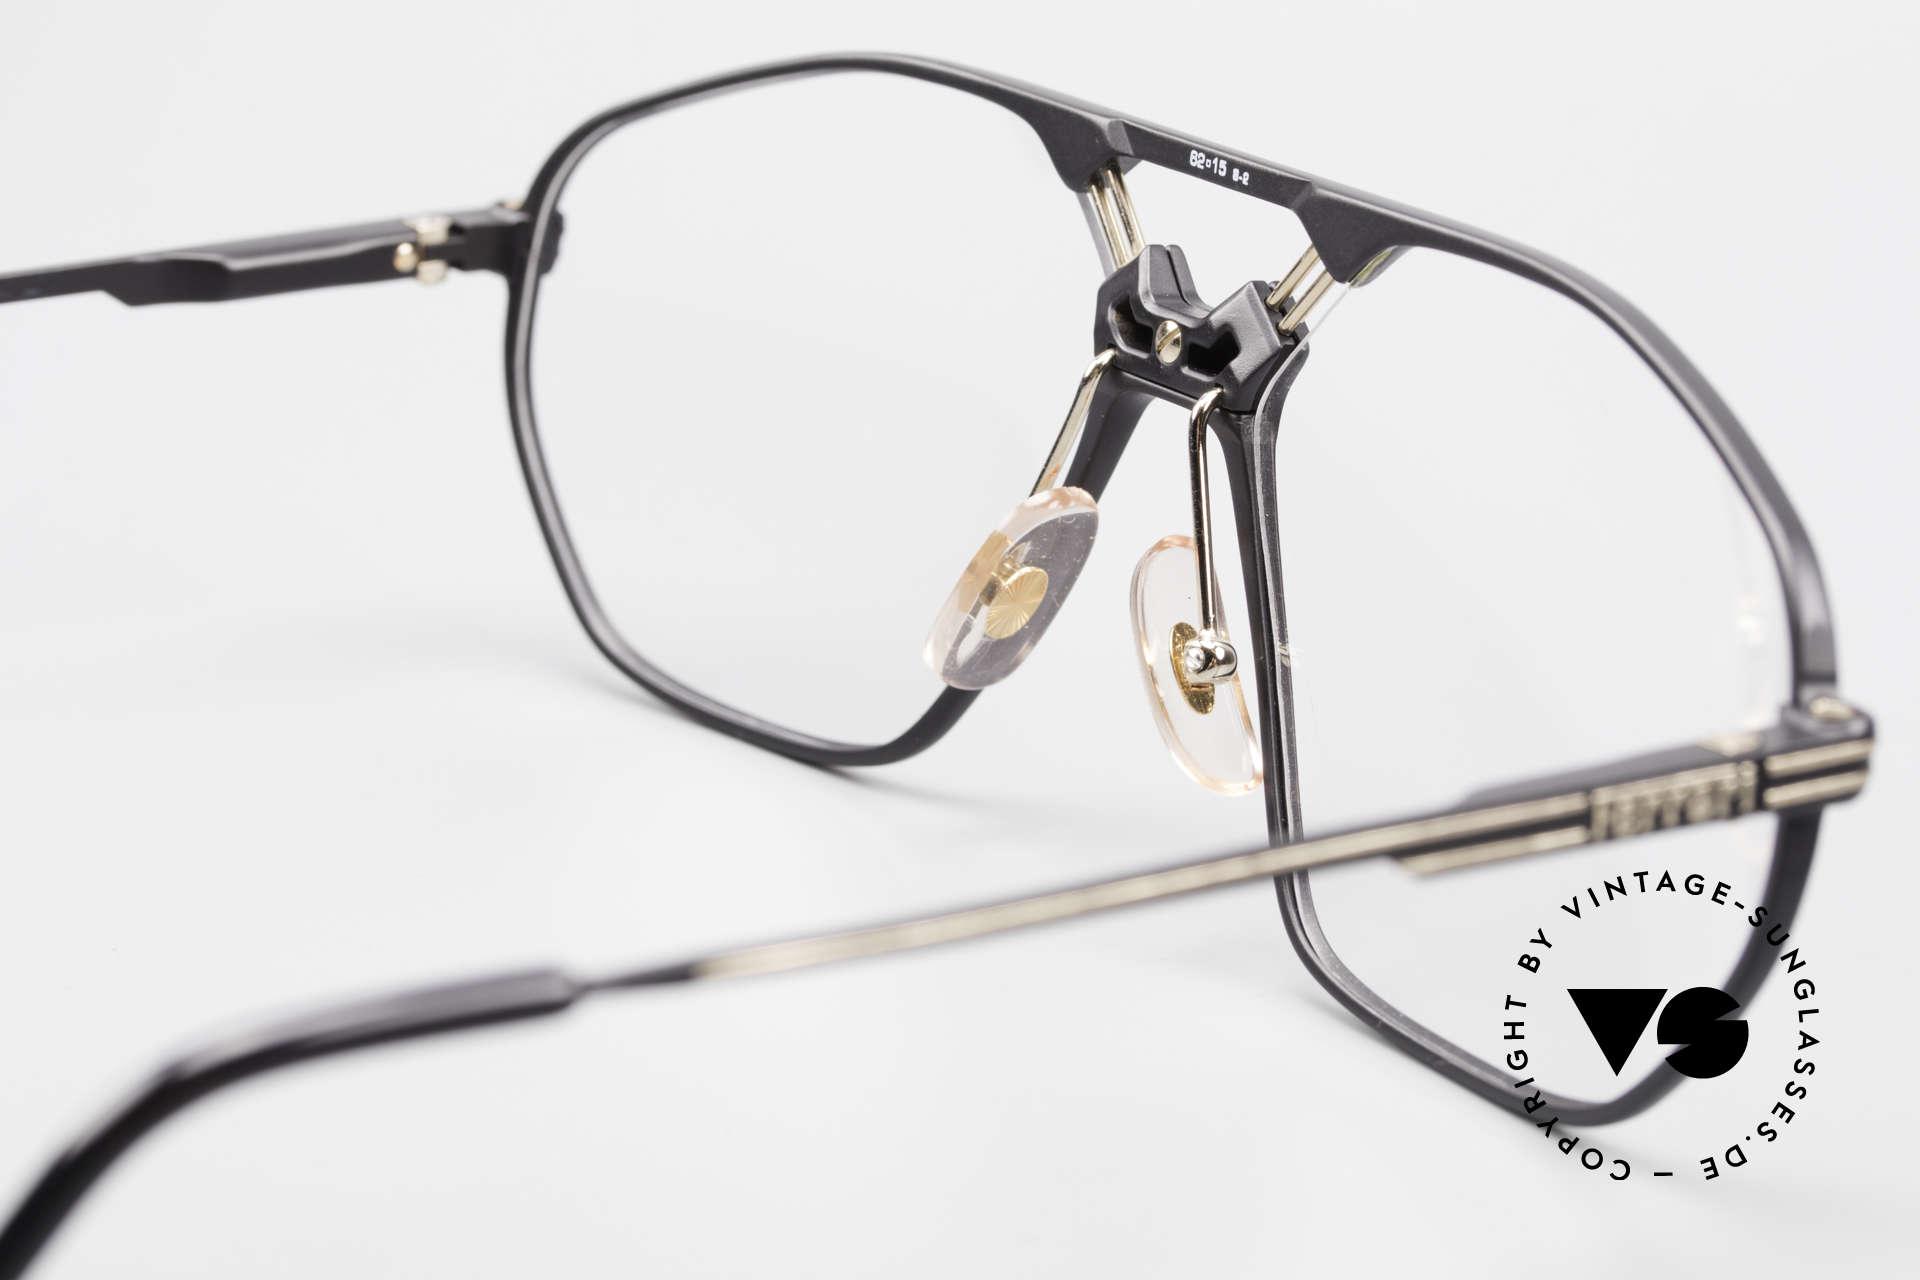 Ferrari F22 Men's Rare Vintage Glasses 90s, top-notch quality; large size 62-15, 140, F22, col 586, Made for Men